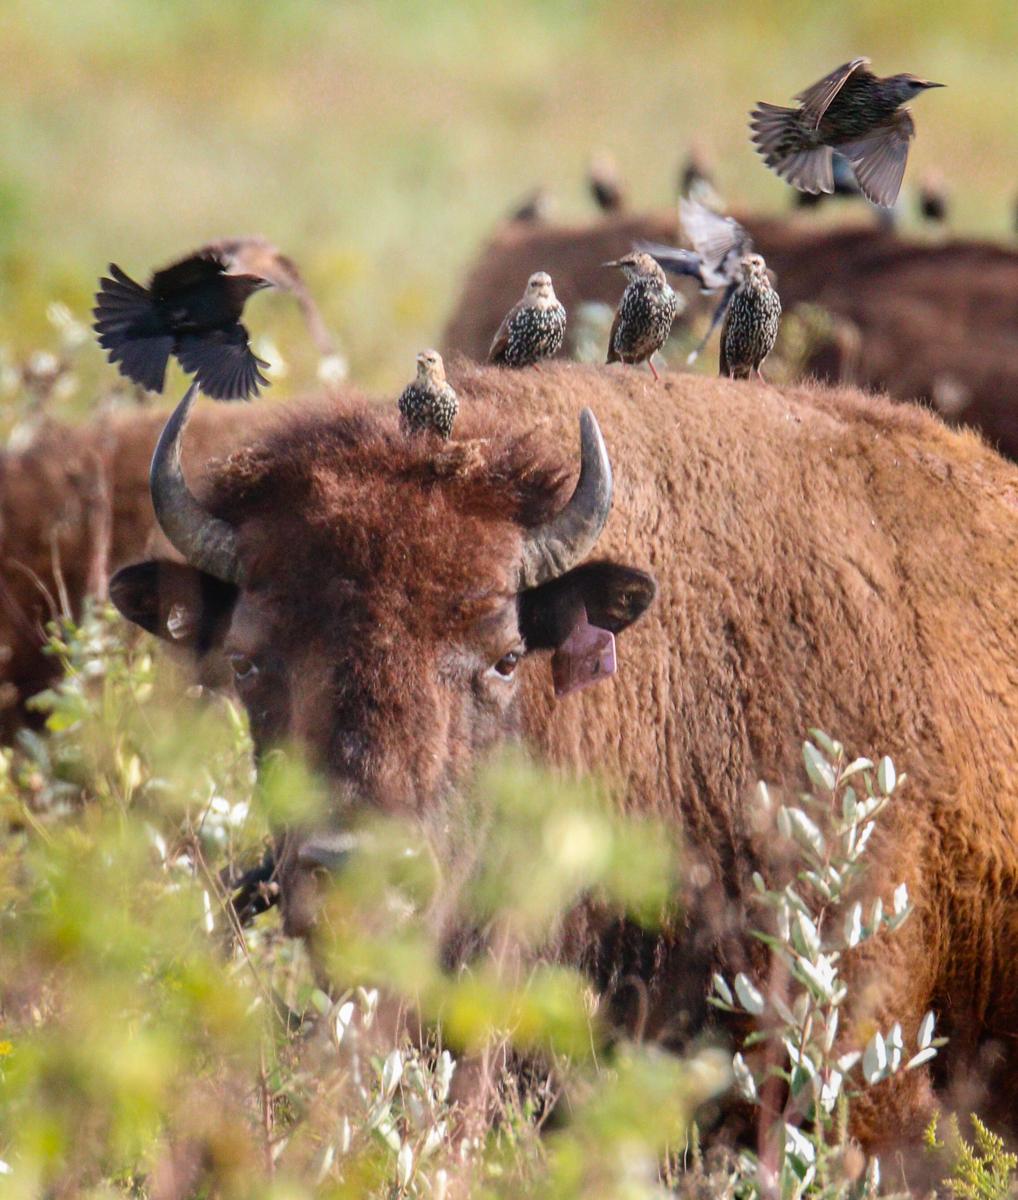 Cowbirds on Bison